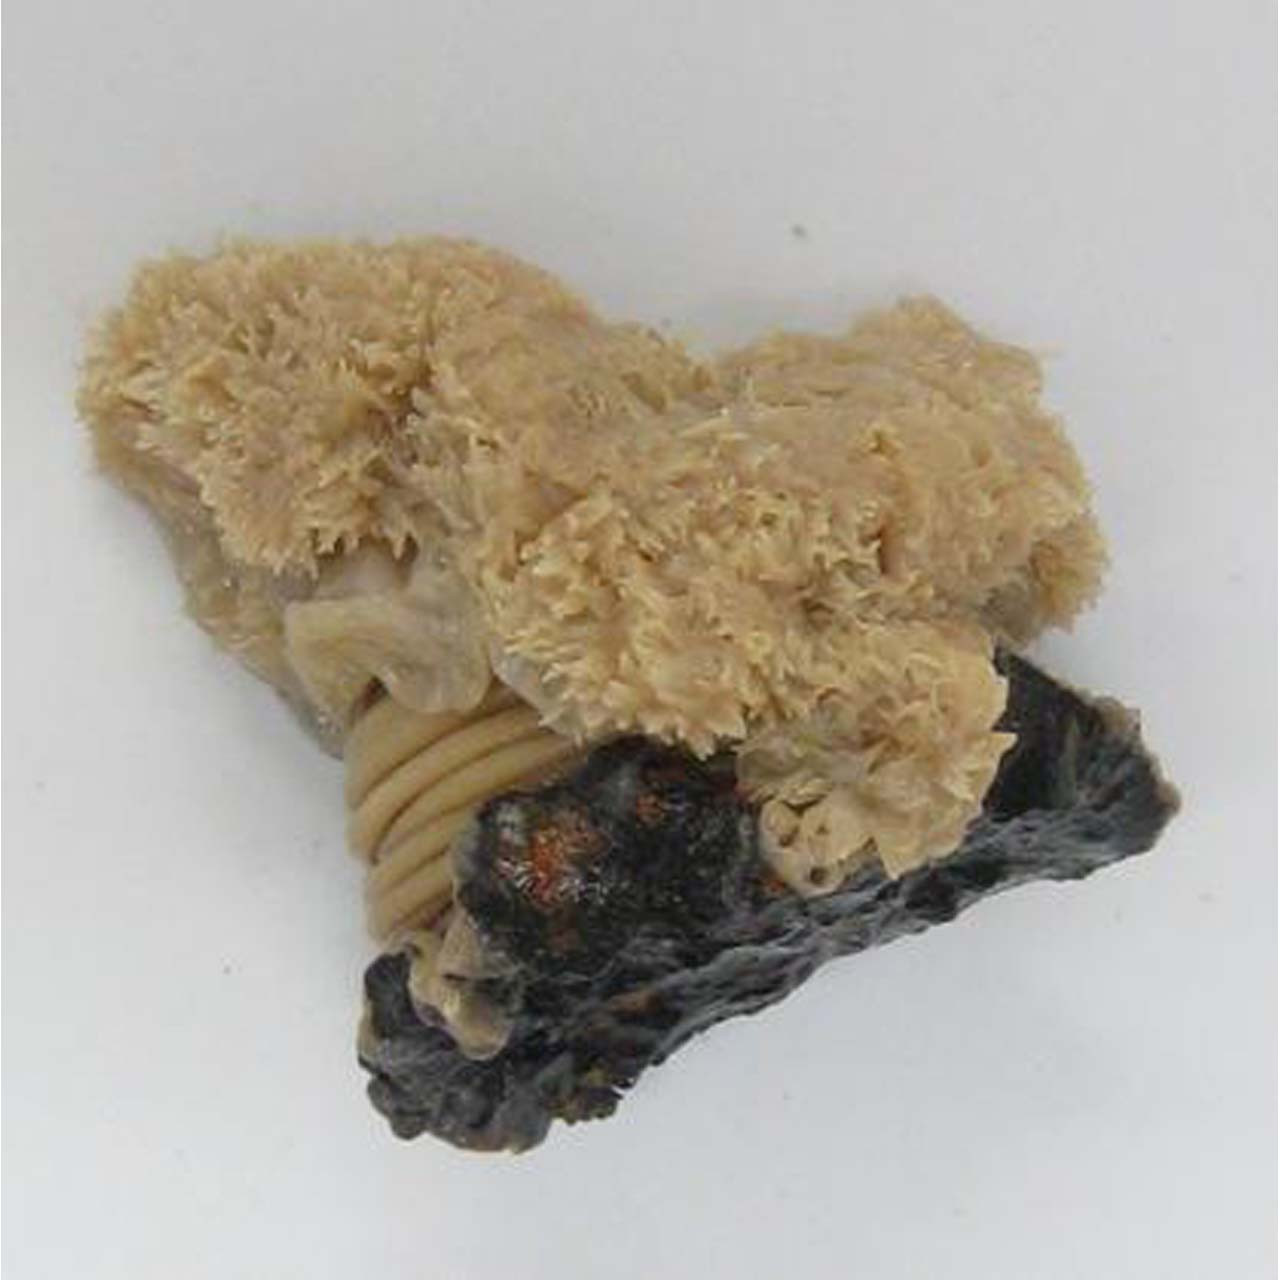 PM4.301 - Sea anemone (Metridium), preserved